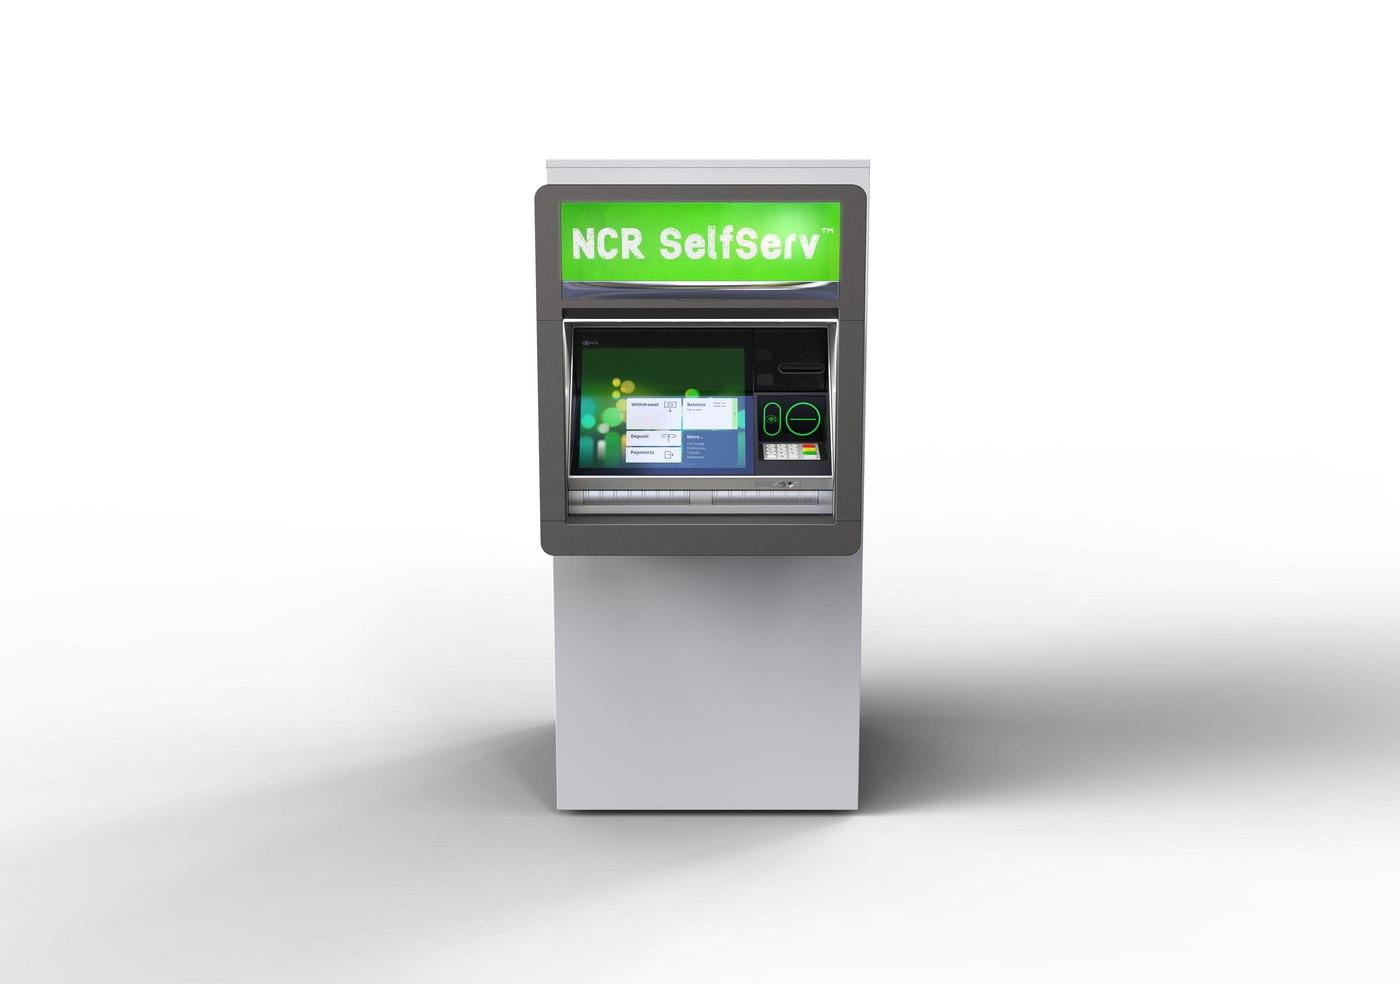 NCR SelfServ 84 Walk-up